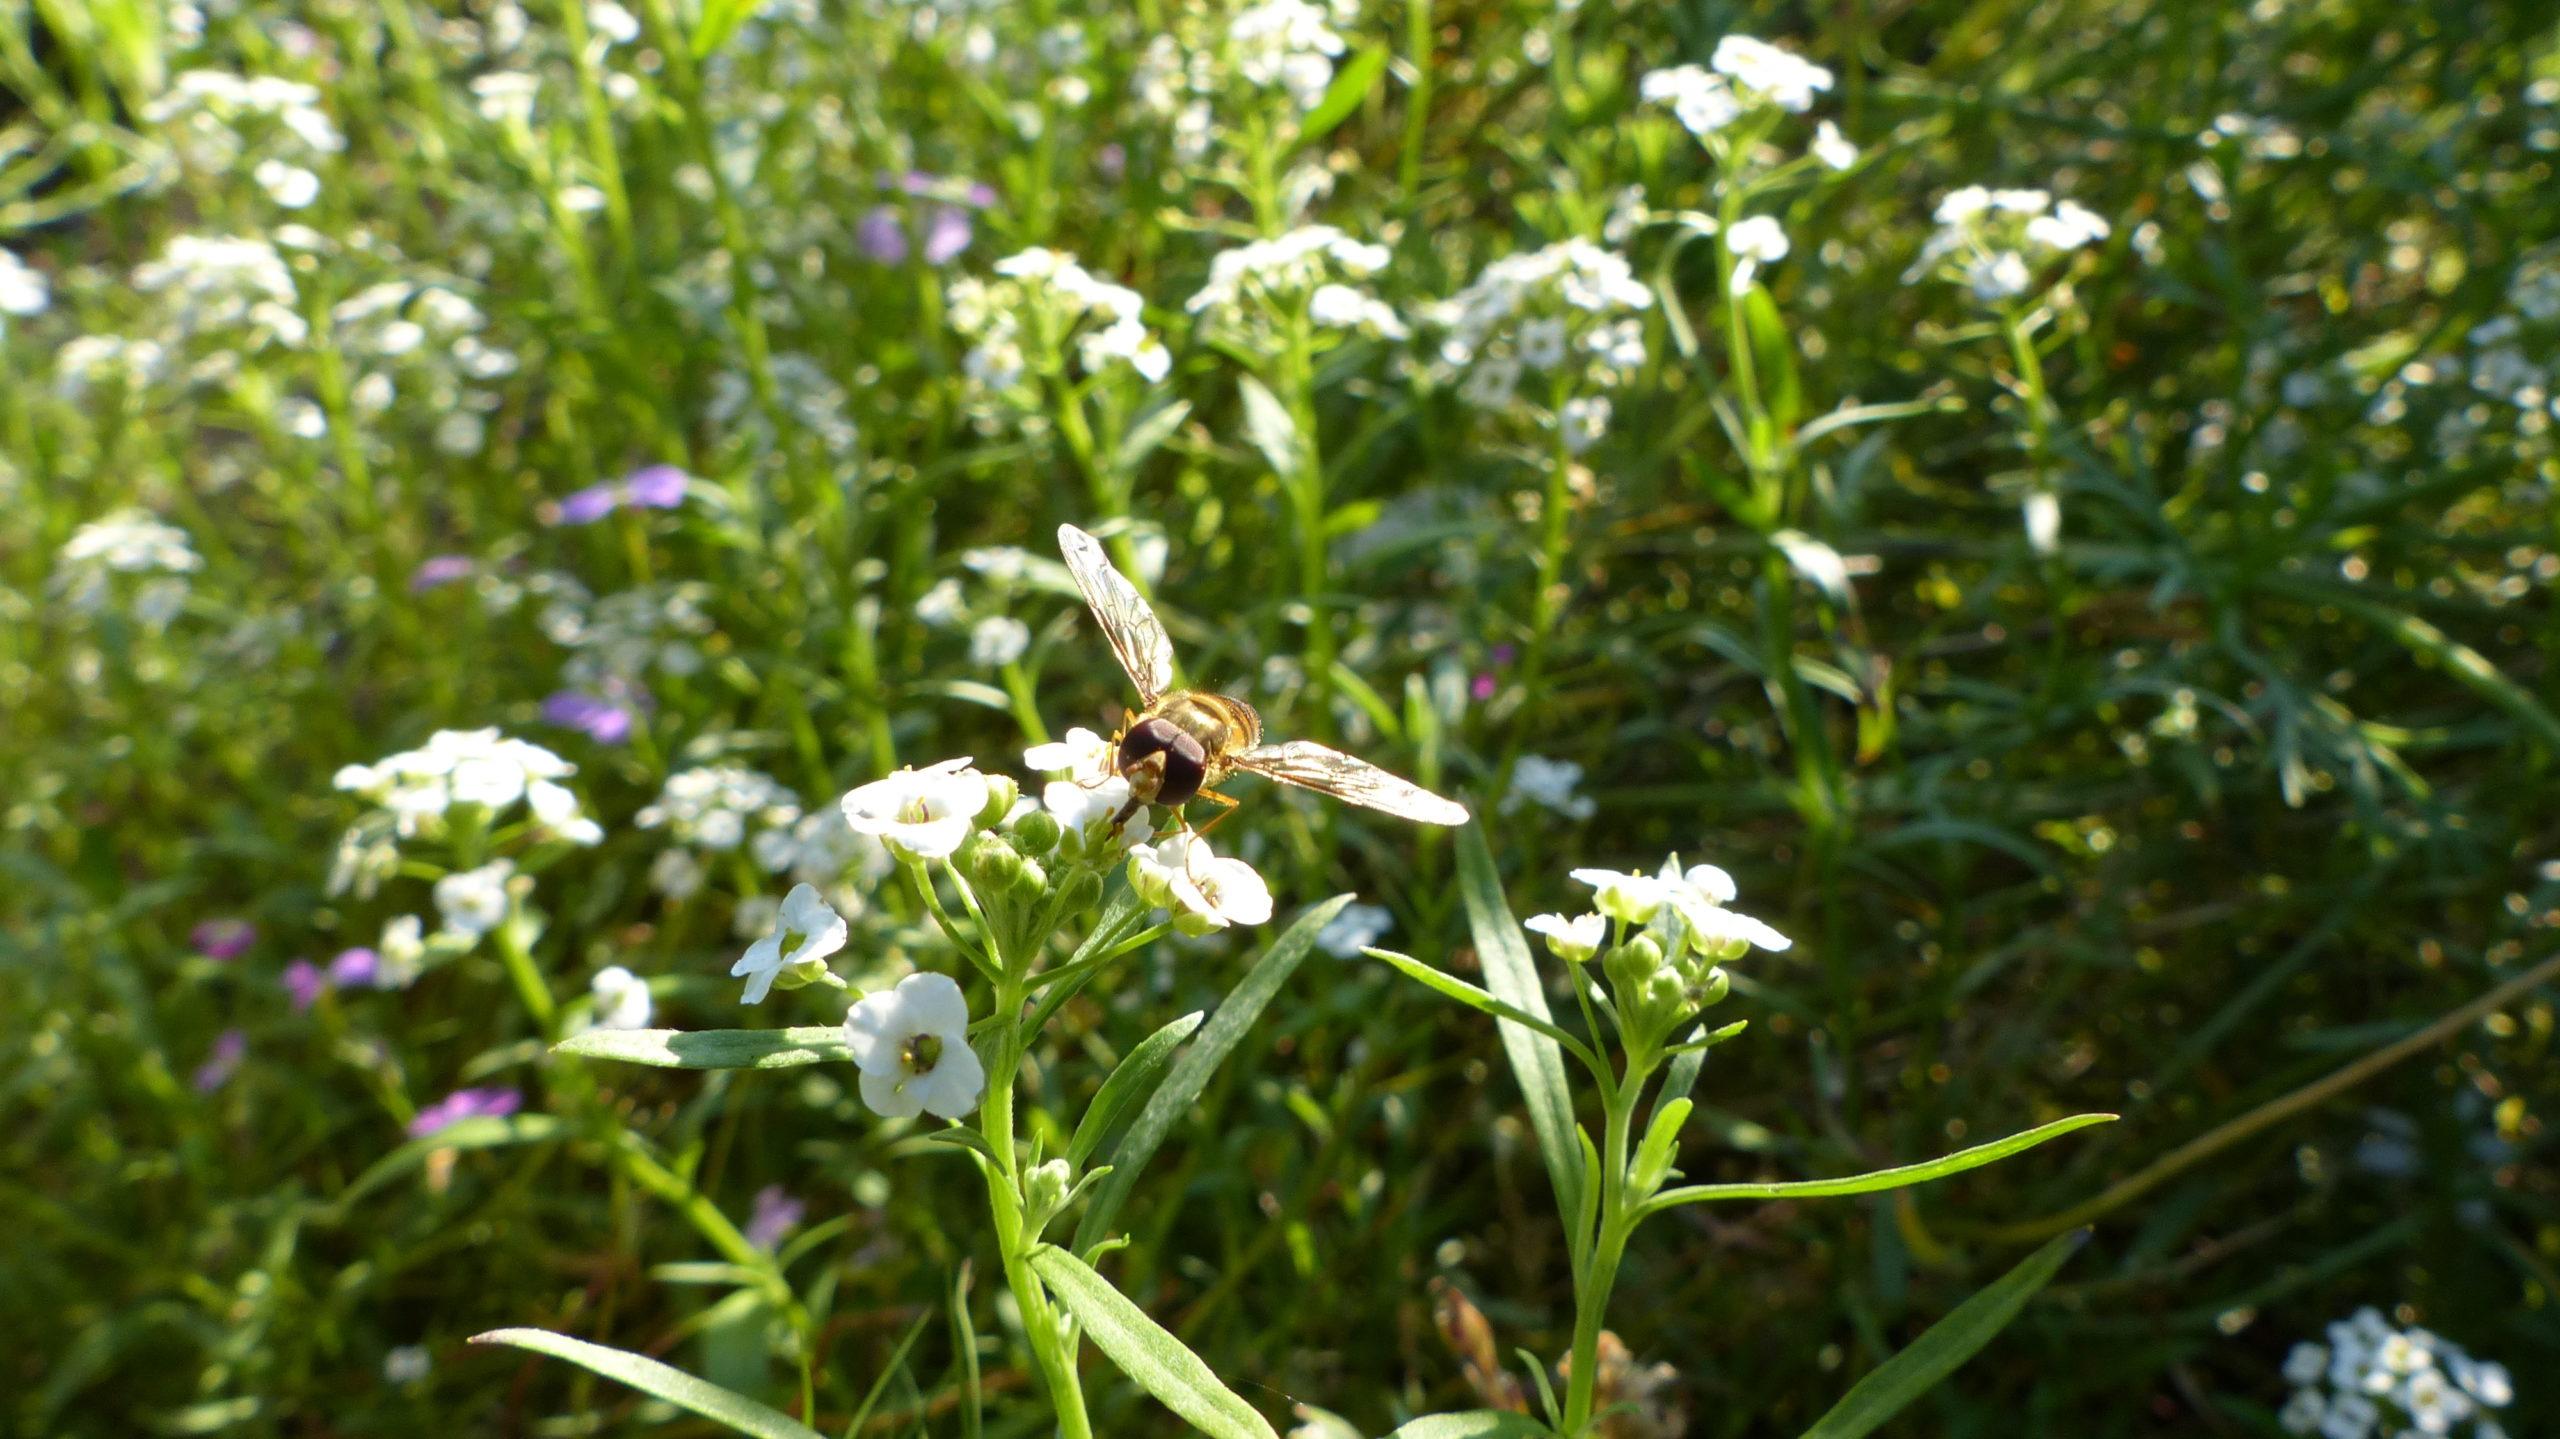 syrphe butinant une fleur